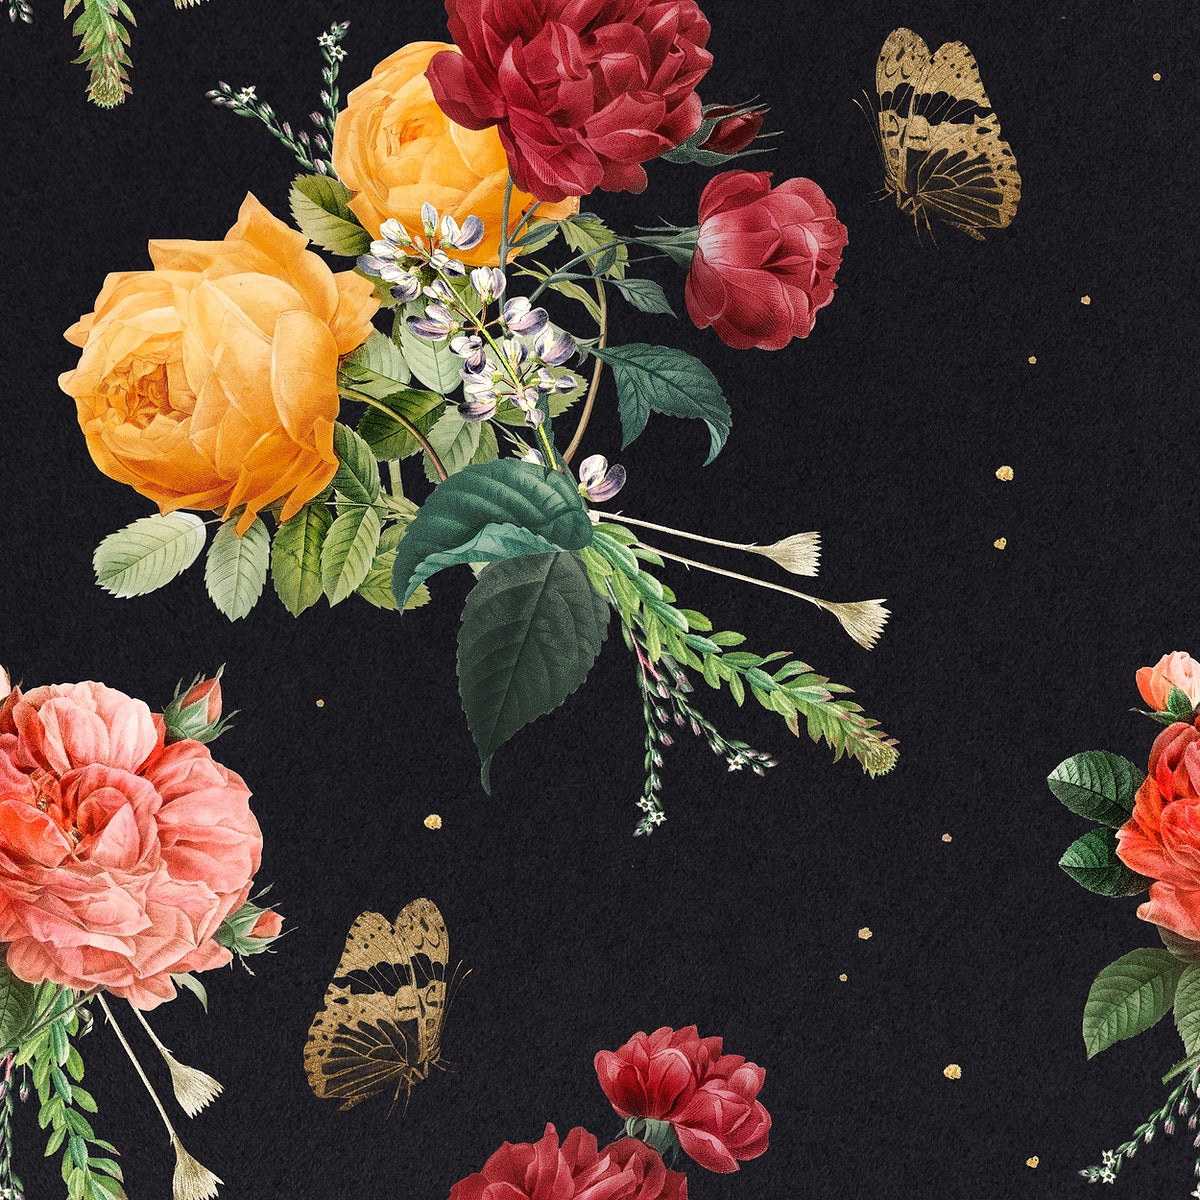 Vintage colorful roses pattern background